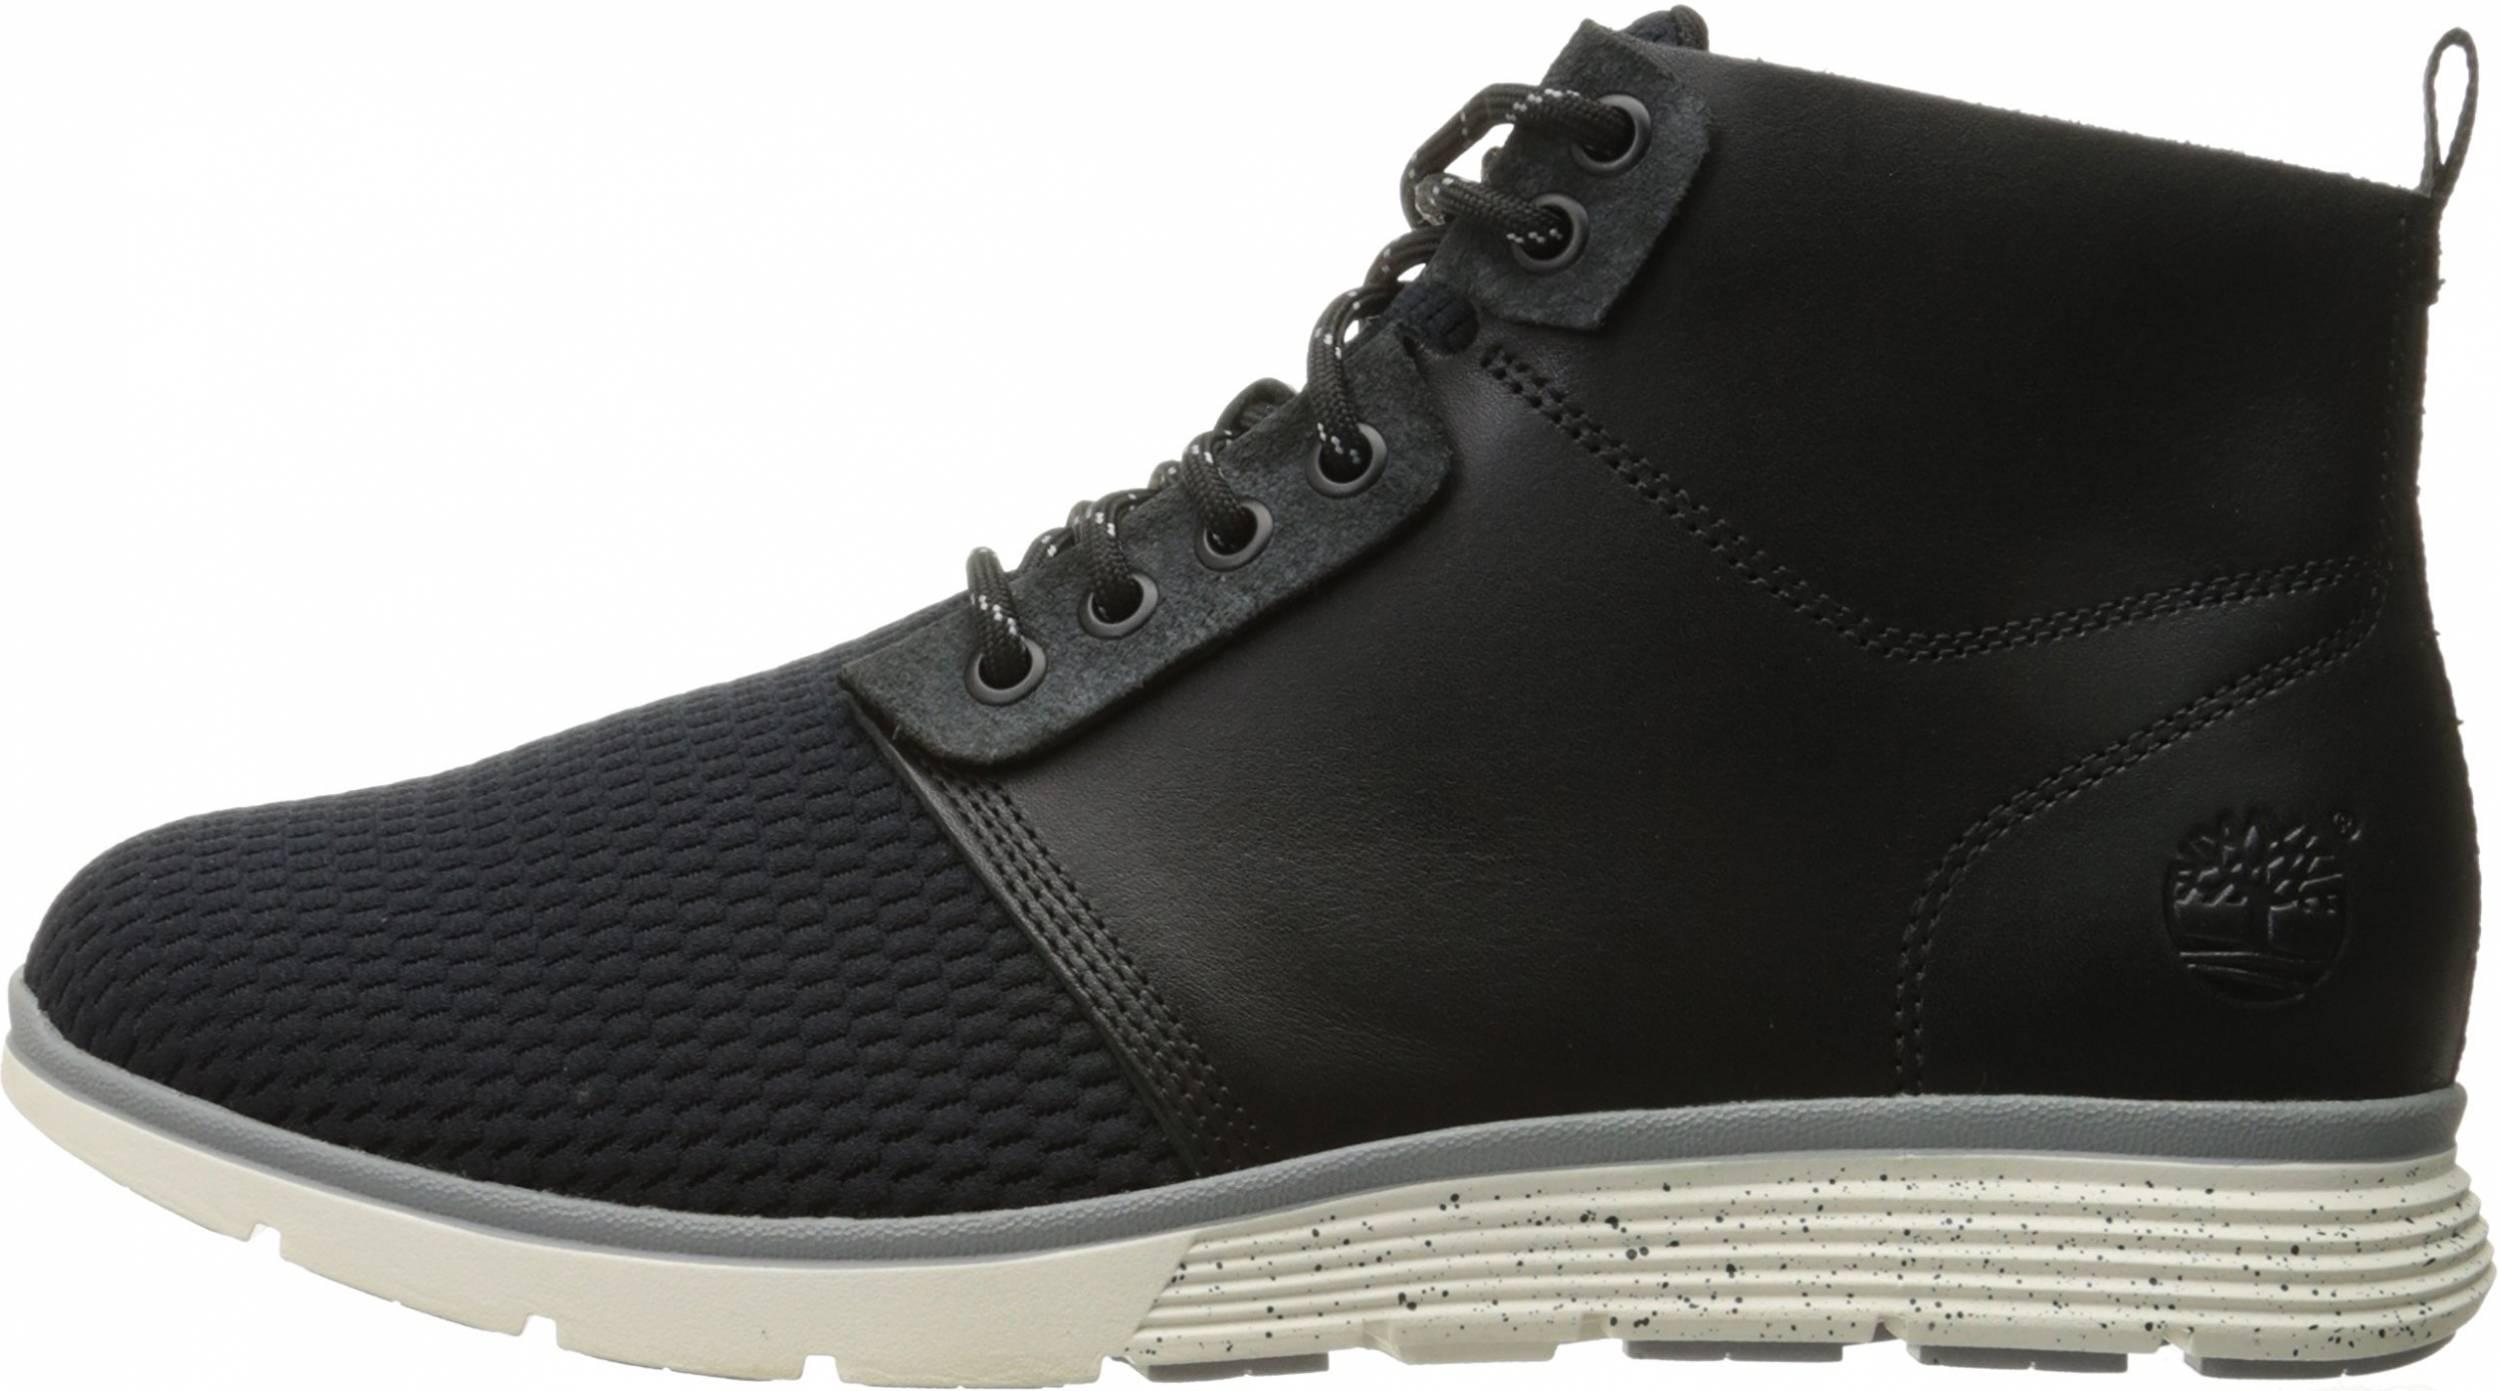 Año bufanda Estar satisfecho  Prices + Review of Timberland Killington Chukka Sneaker Boots | RunRepeat